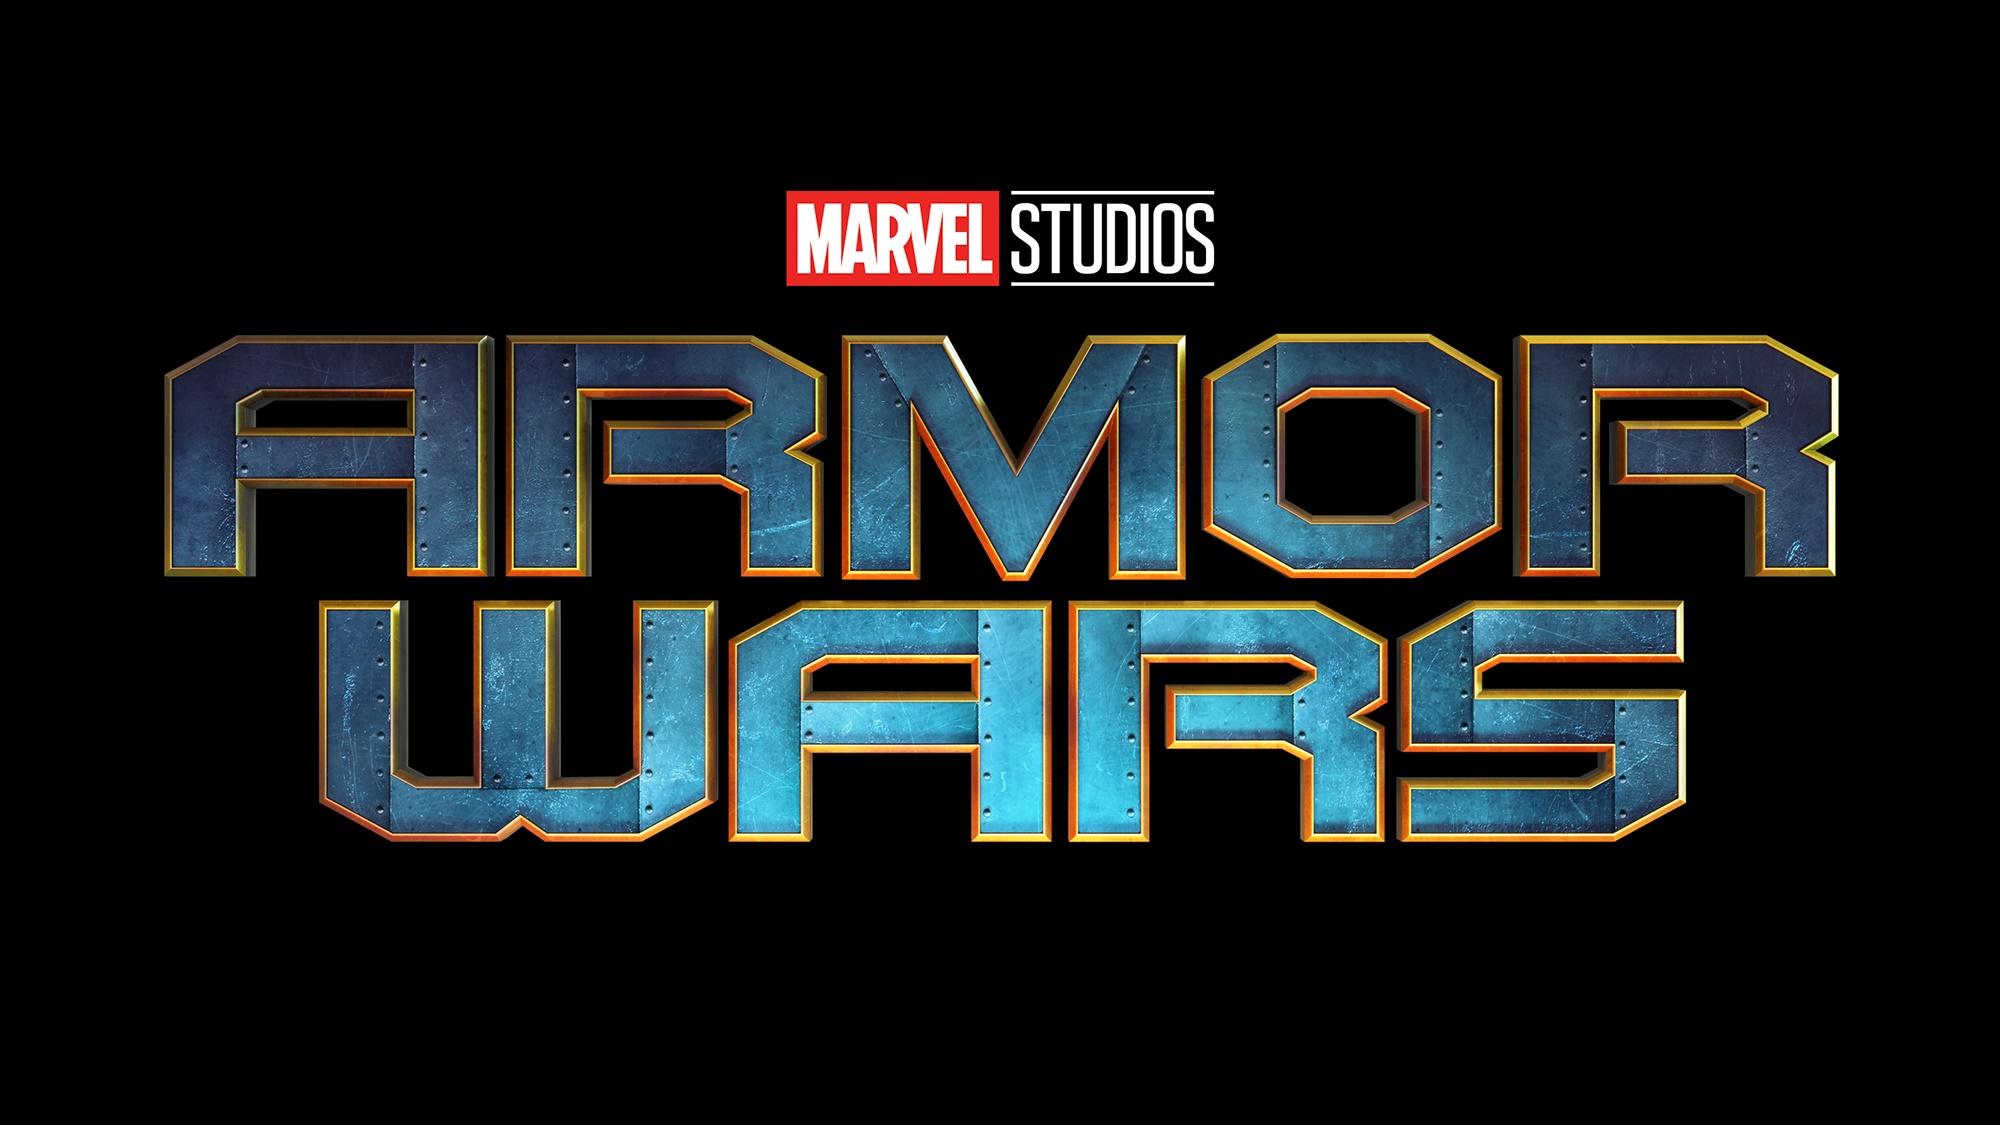 armor_wars.jpg